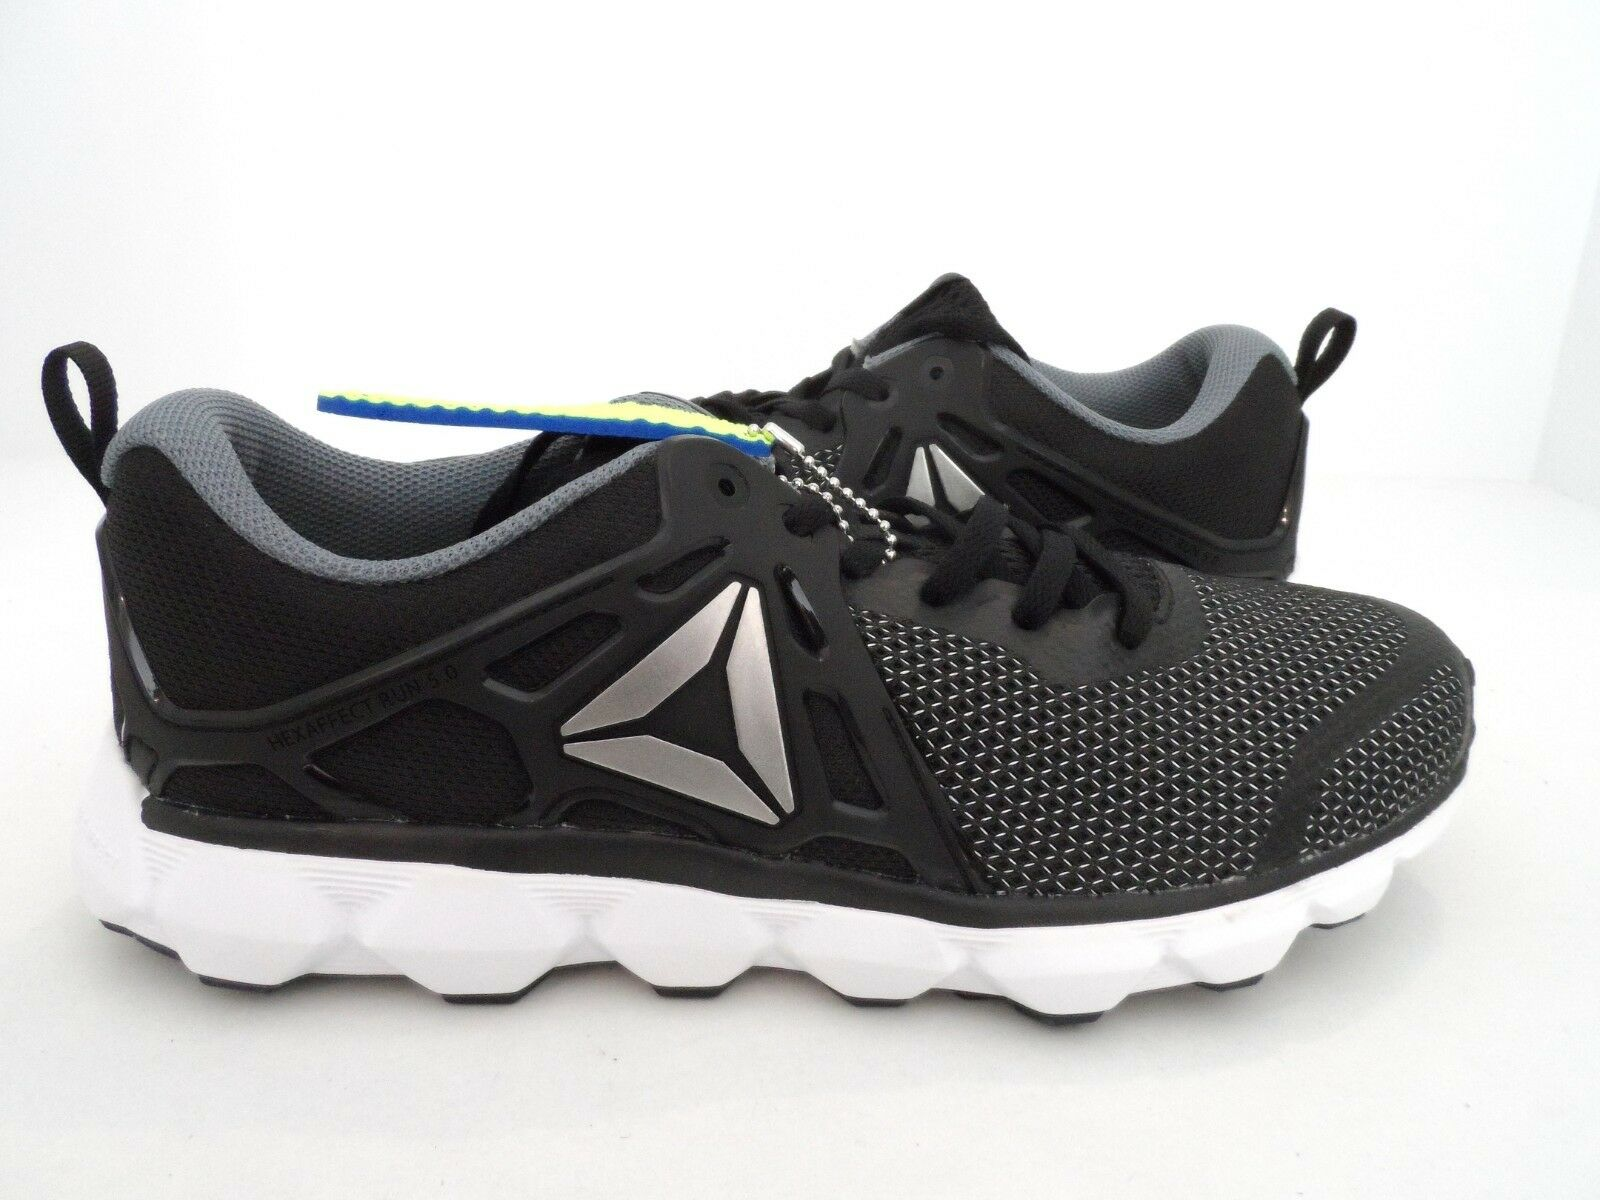 Reebok Women's Hexaffect Run 5.0 Running shoes Black Asteroid Dust White Size 11